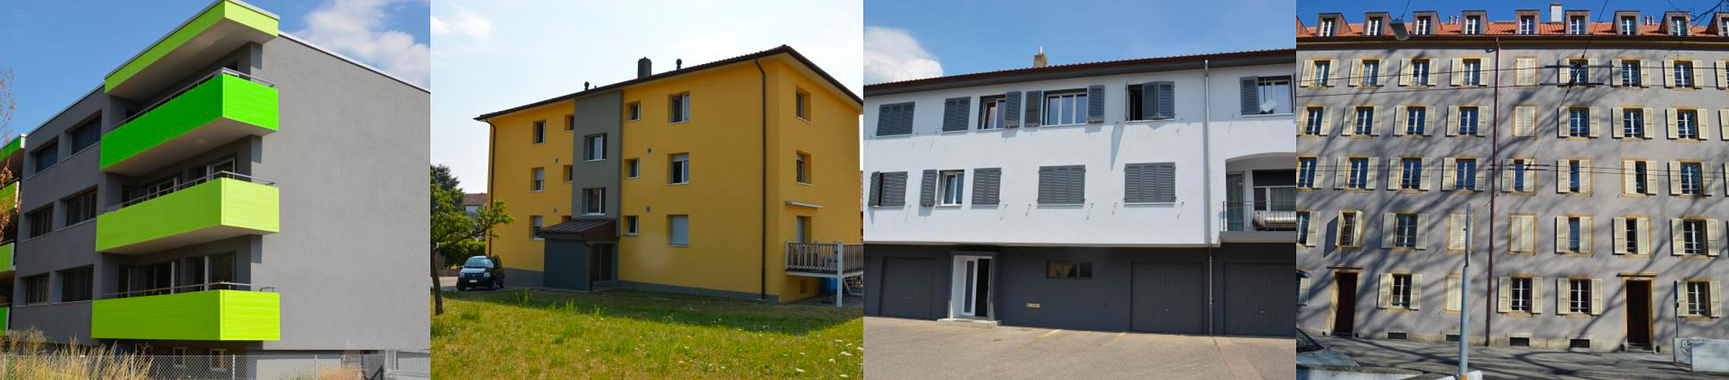 Buschini SA Plâtrerie - Peinture - Isolation - Neuchâtel